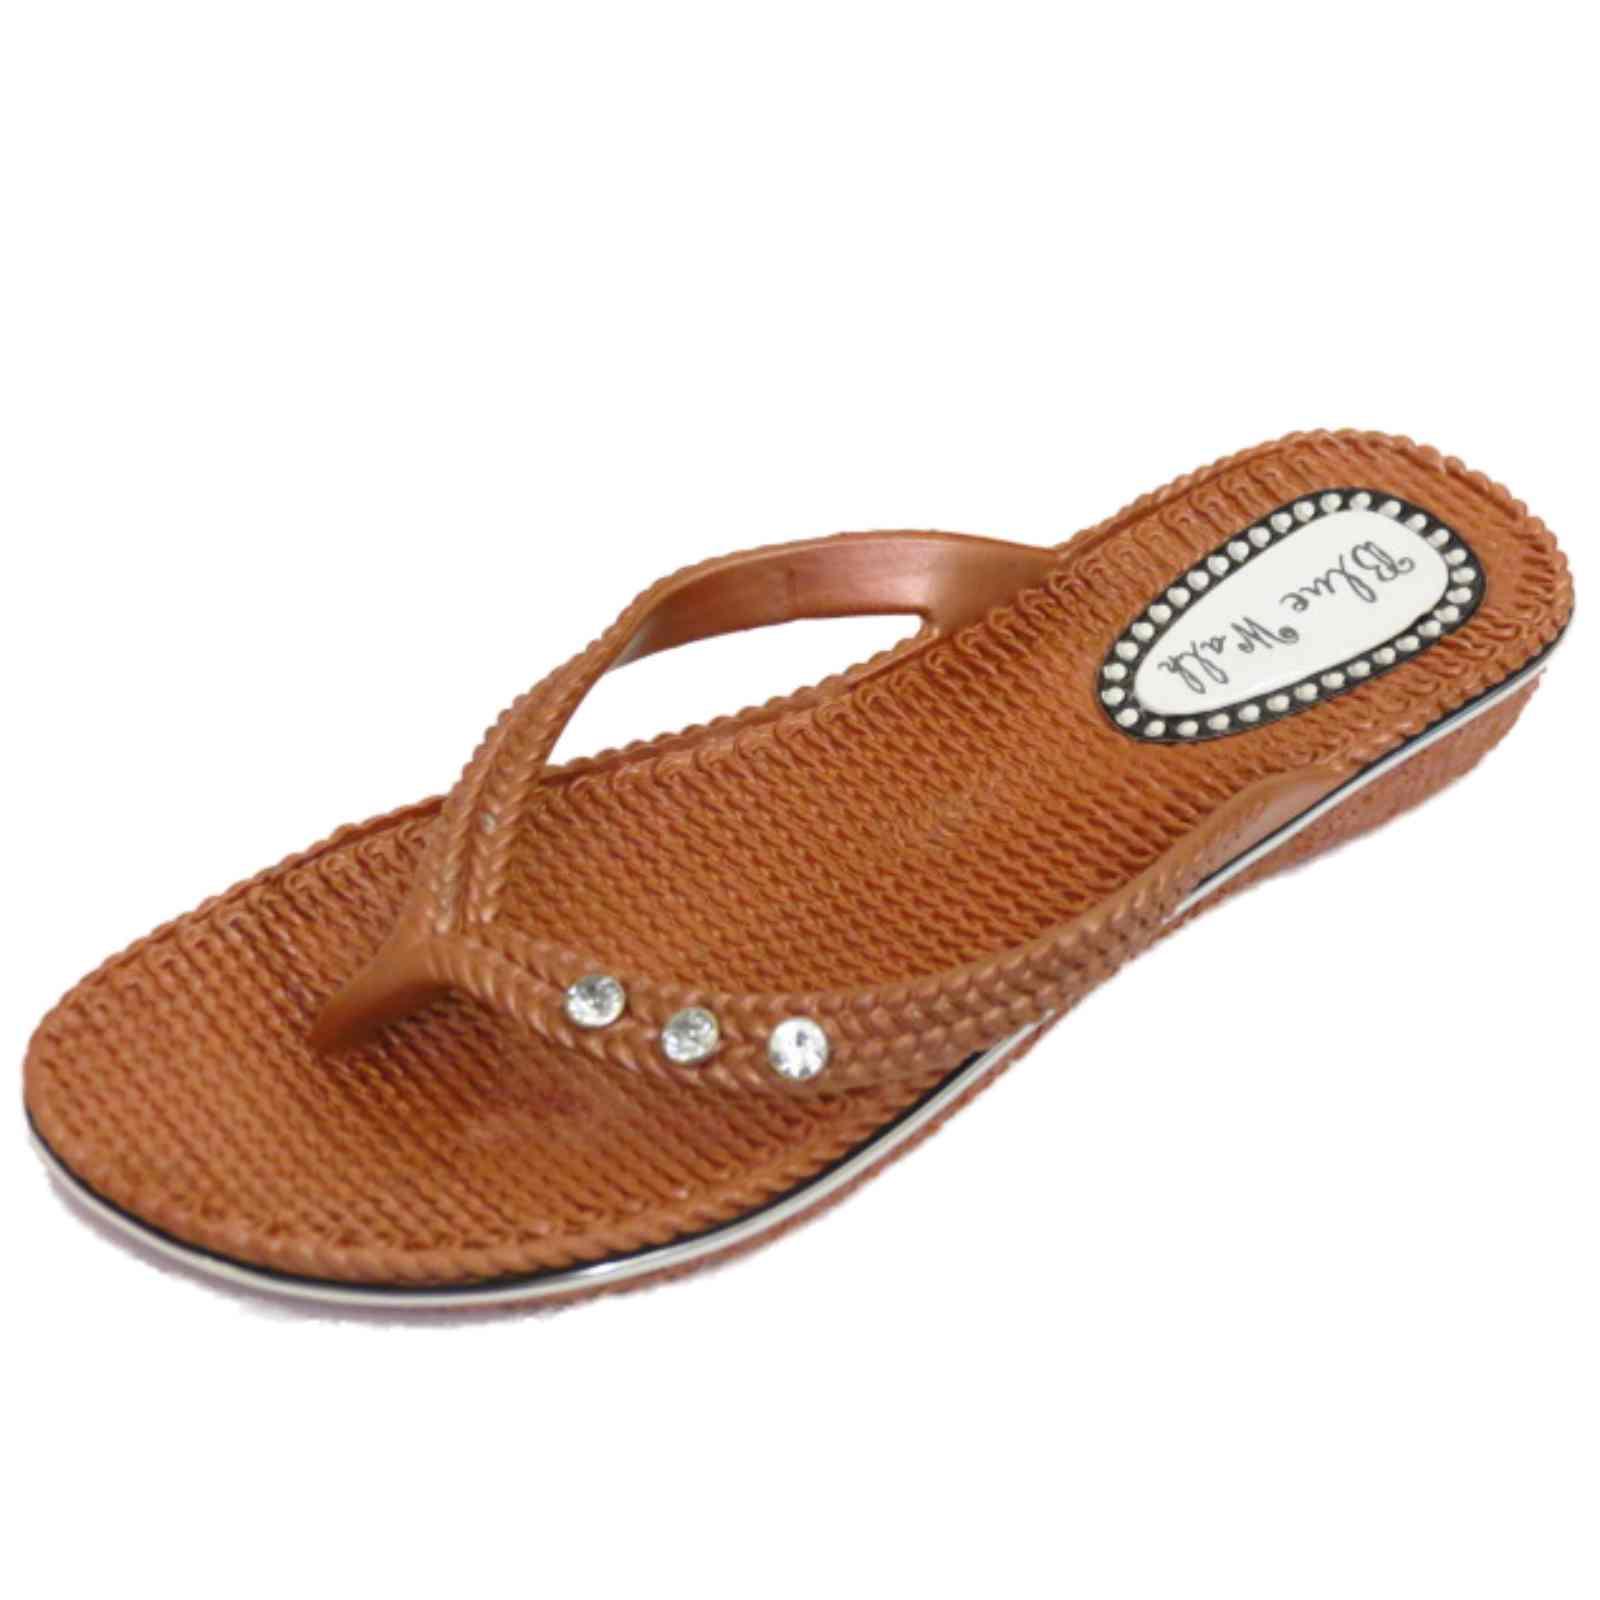 Mujeres Plana Bronce Toe Post Playa Verano Jalea Flip-flop Zapatos Sandalias Tallas 3-8